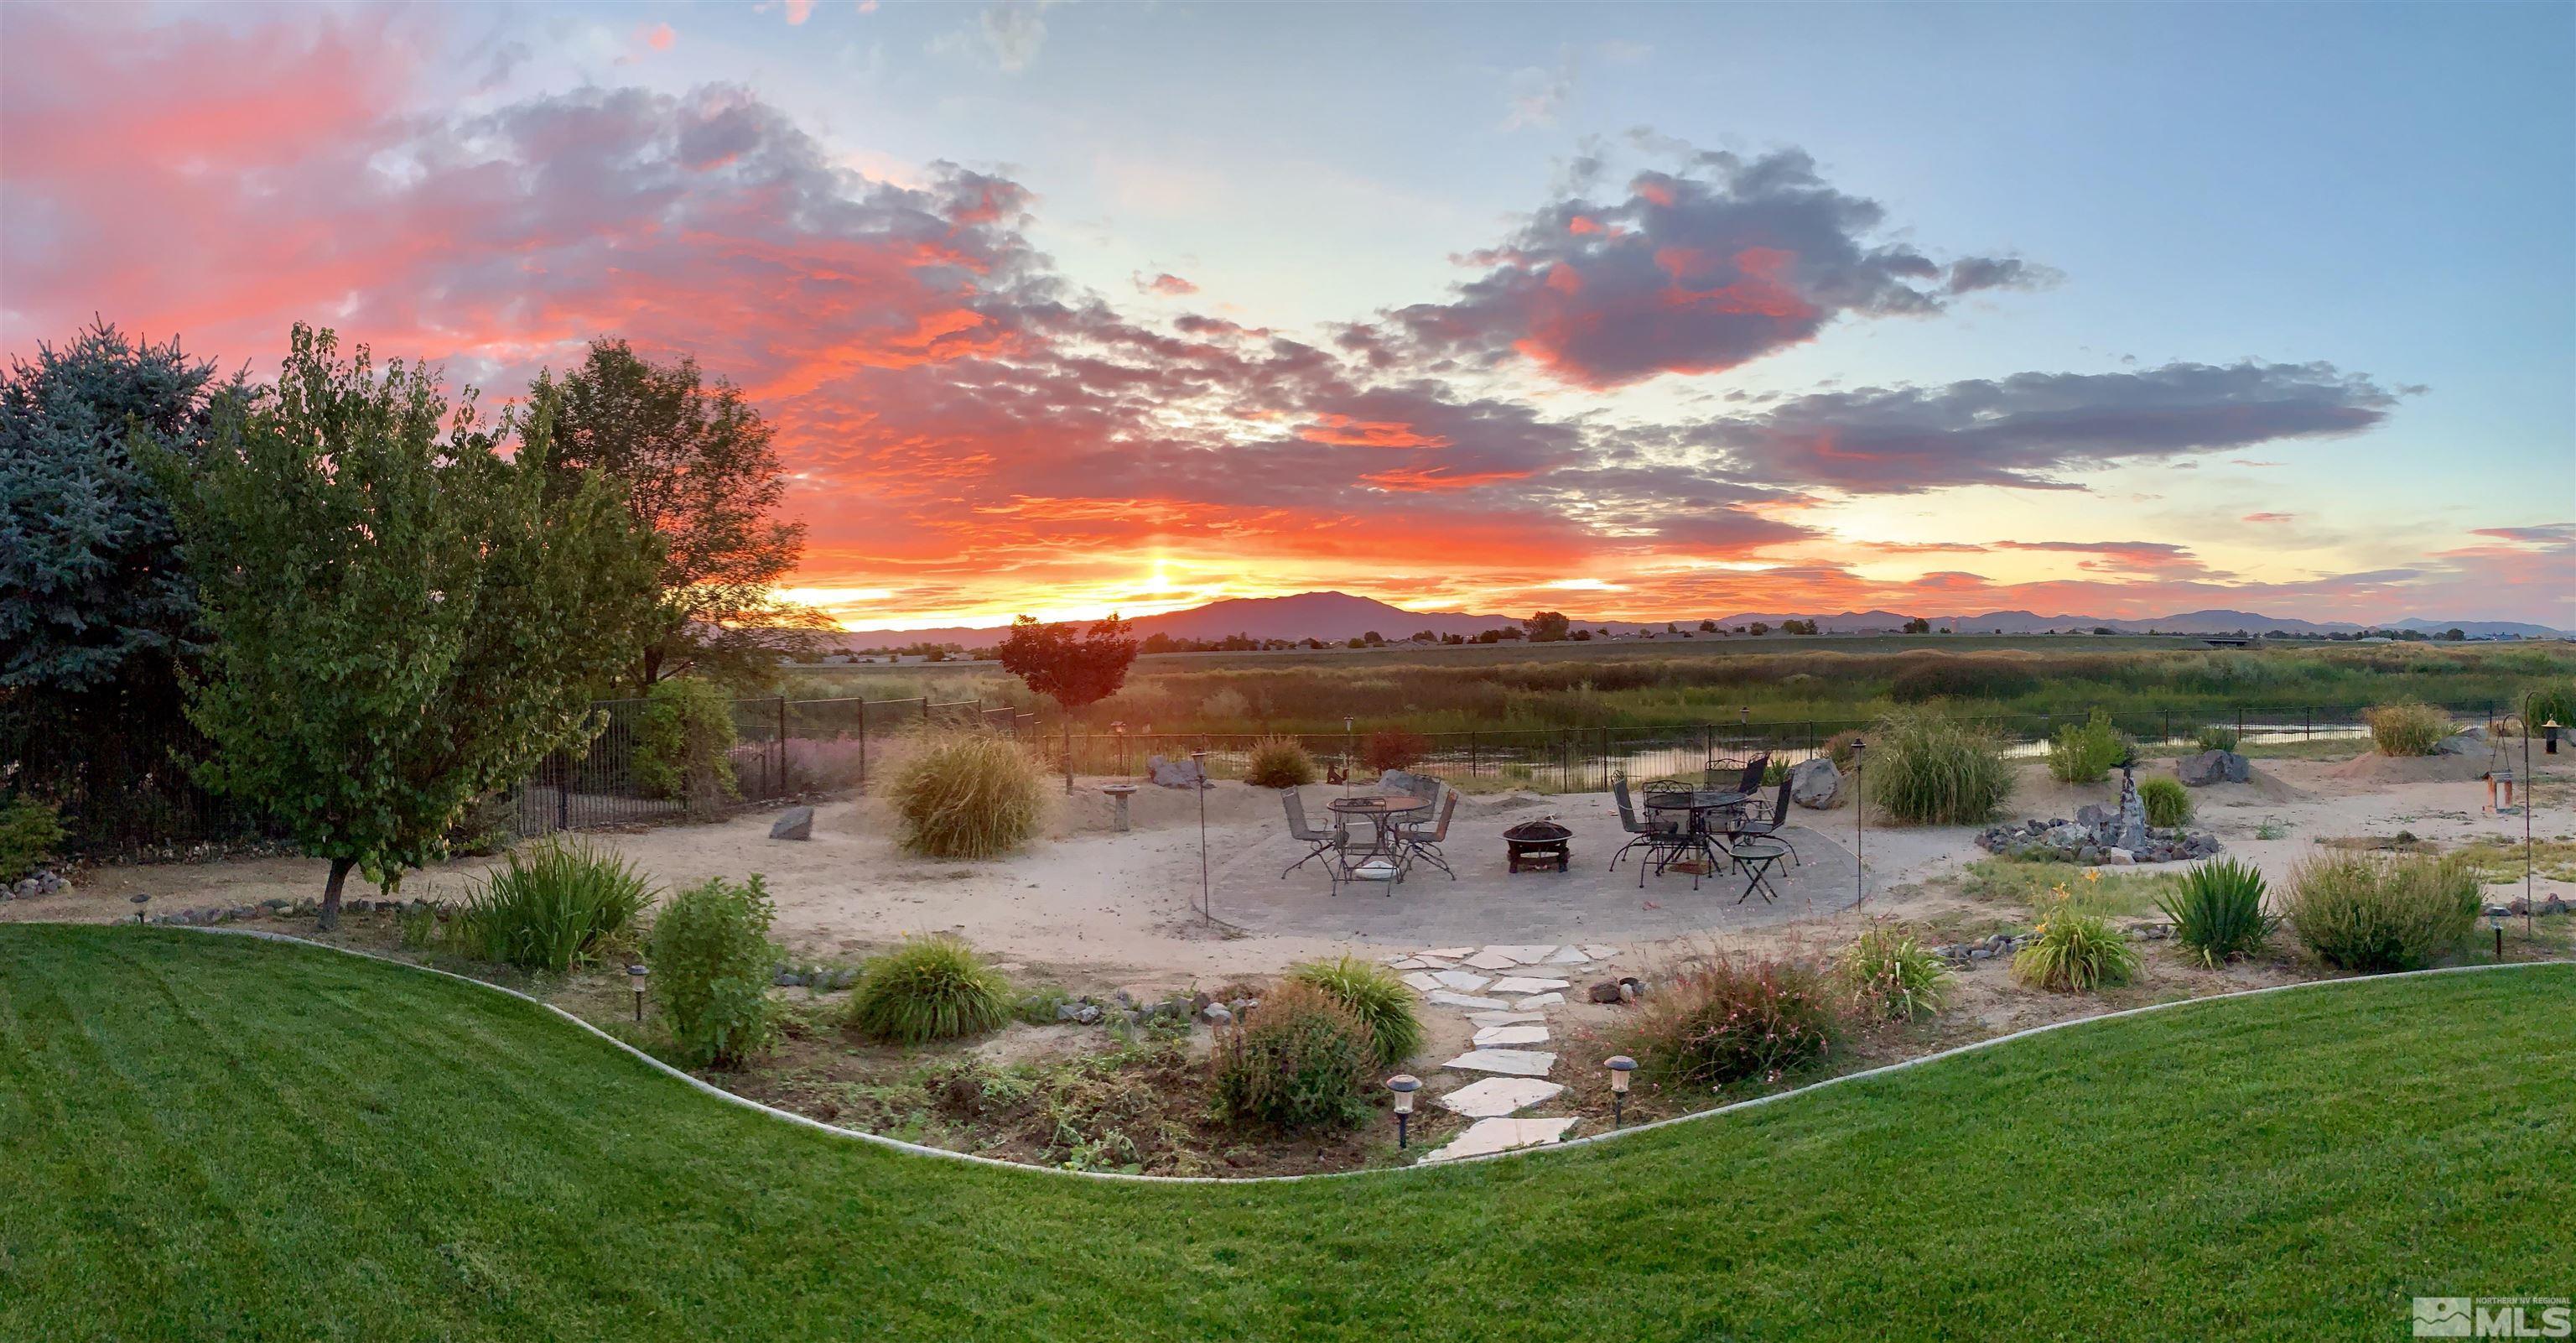 Image for 5409 Hidden Valley Ct, Reno, NV 89502